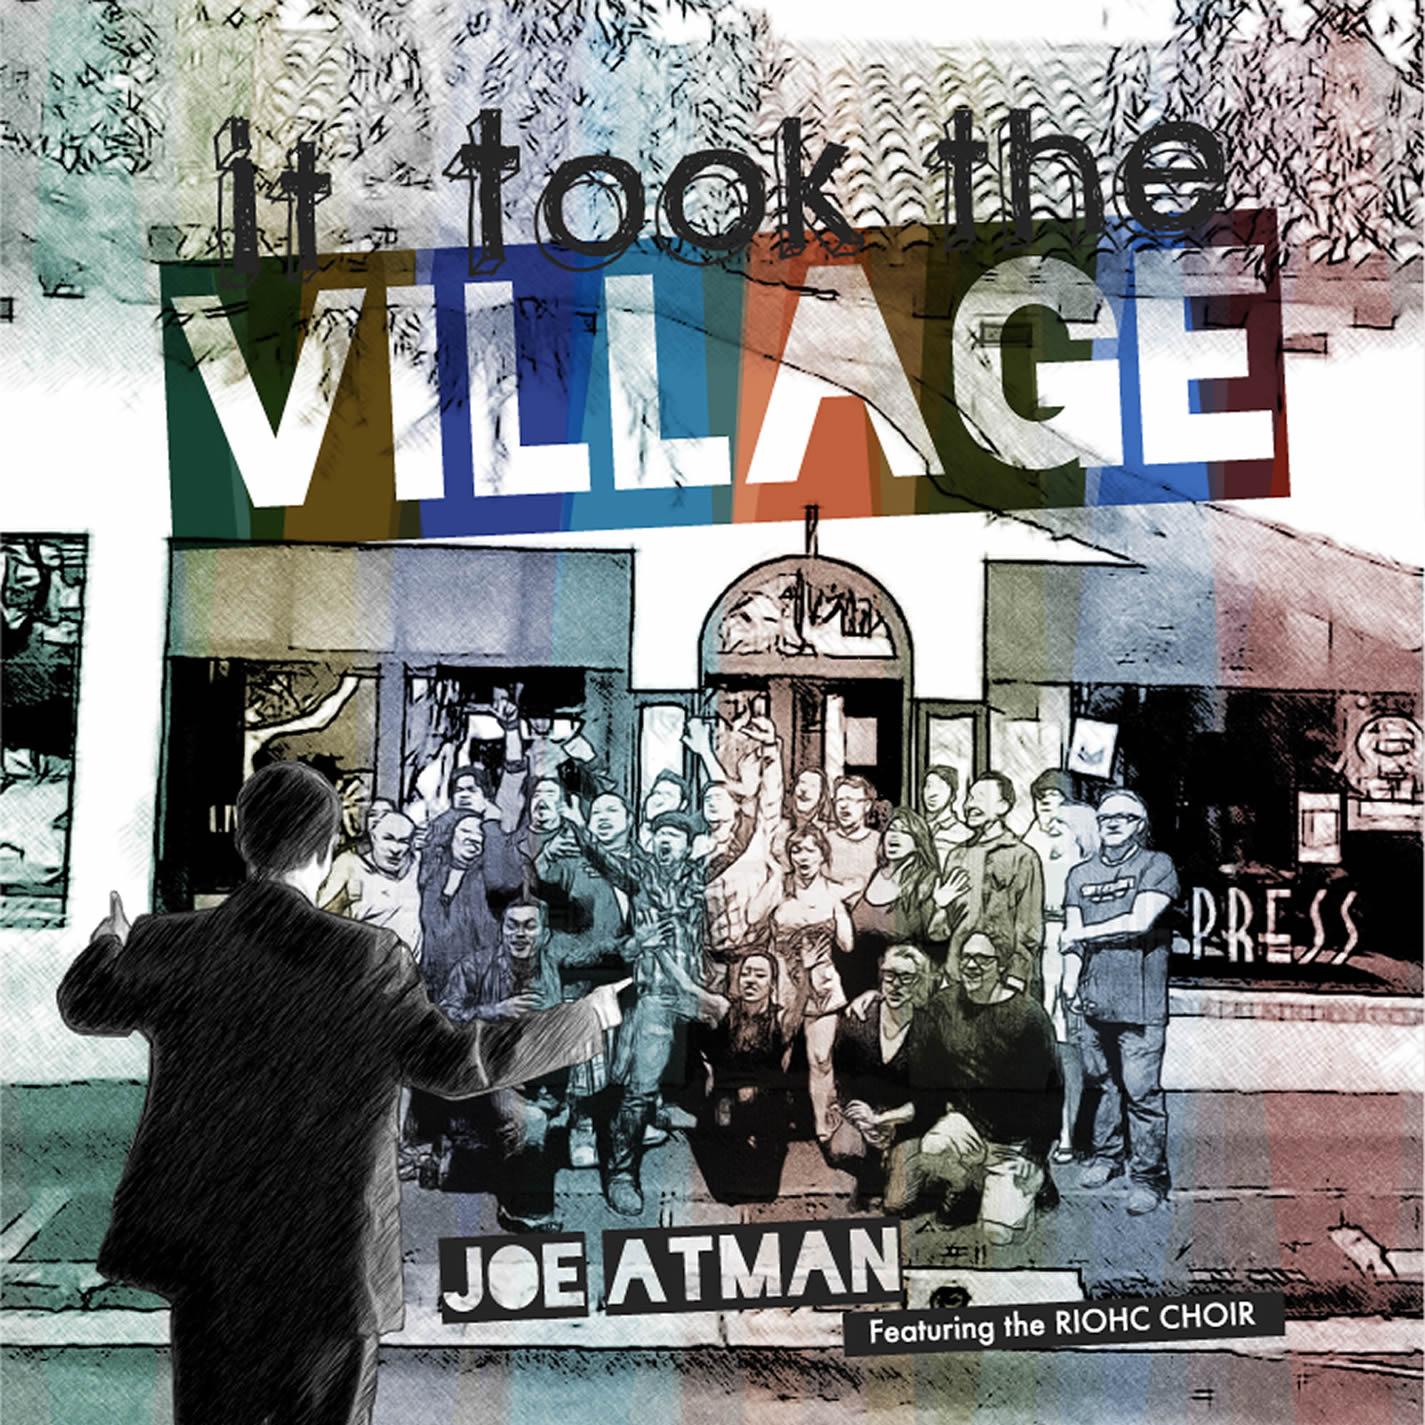 Joe Atman feat. Riohc Choir (Pop, AAA, Adult Contemporary, Singer/Songwriter, Piano)